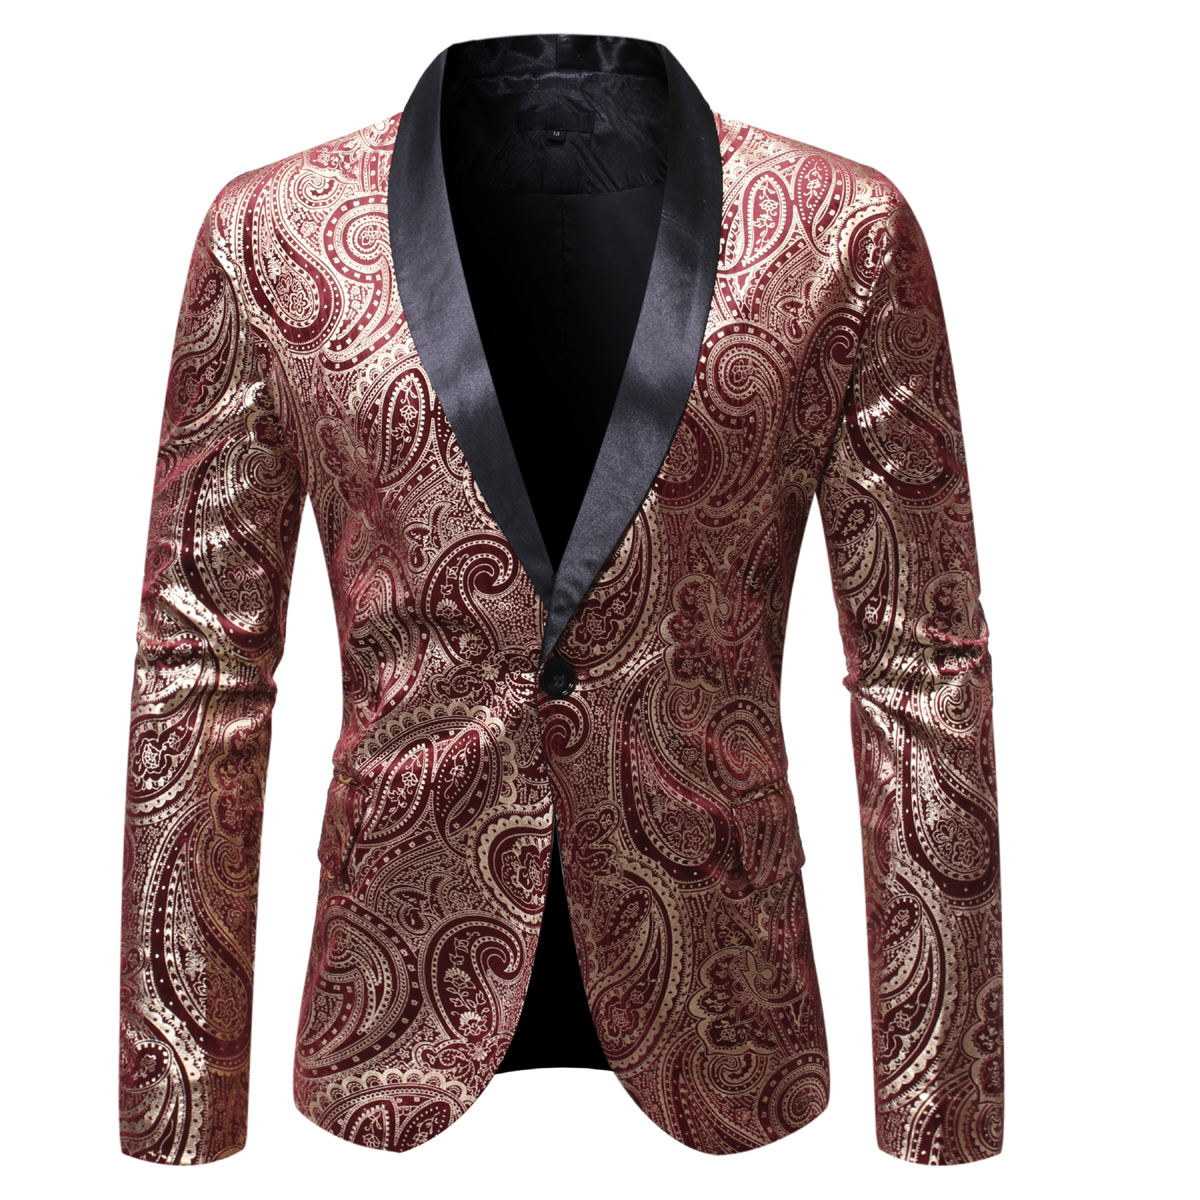 MJARTORIA 2019 New Mens Autumn Pirnt Casual Blazers England Style A Buckle Suits Men Blazer Slim Fit Embroidery V-Neck Blazer